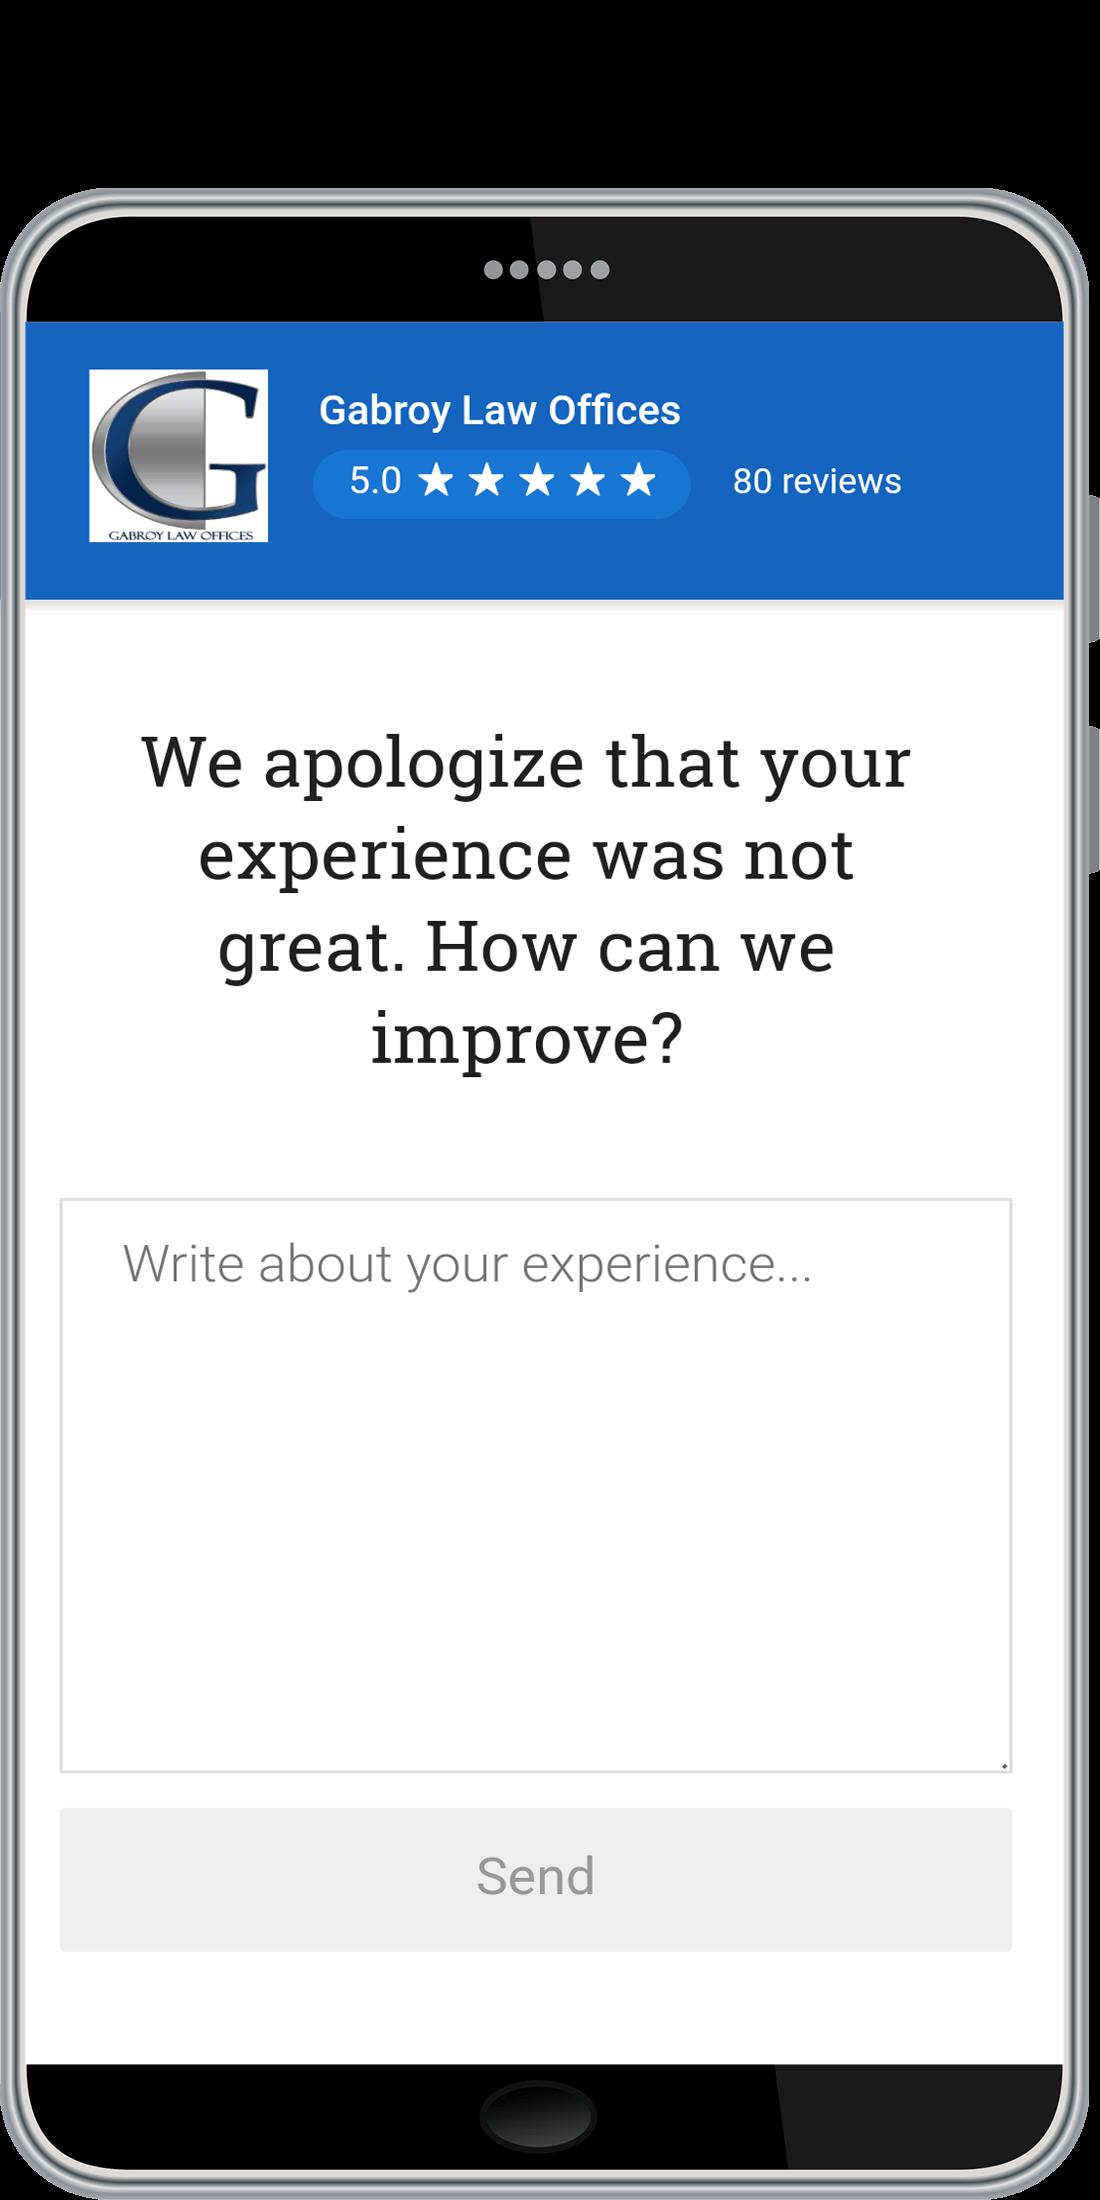 Business Management Software, Review Management System Screenshot